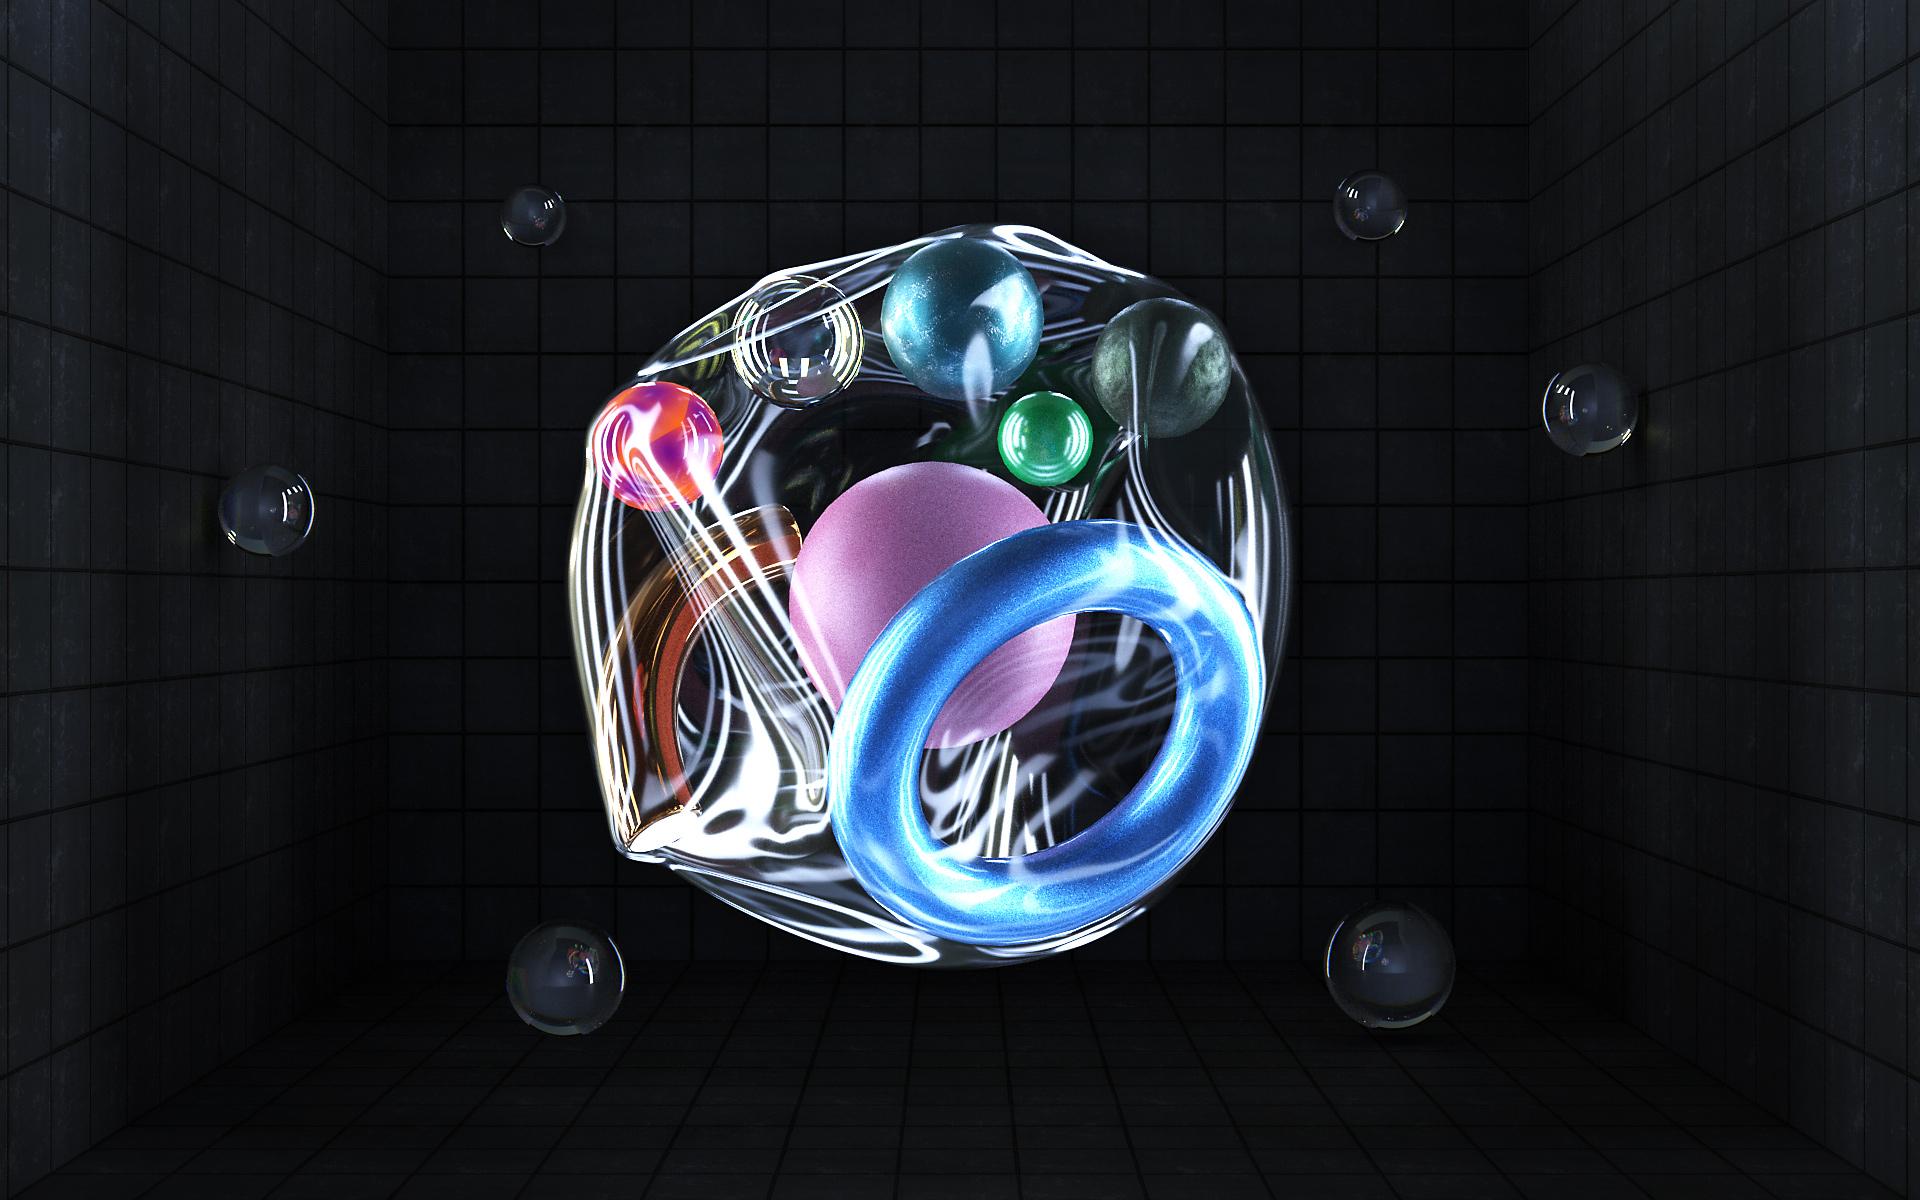 Plastic_Ball_3D_scene_ardura